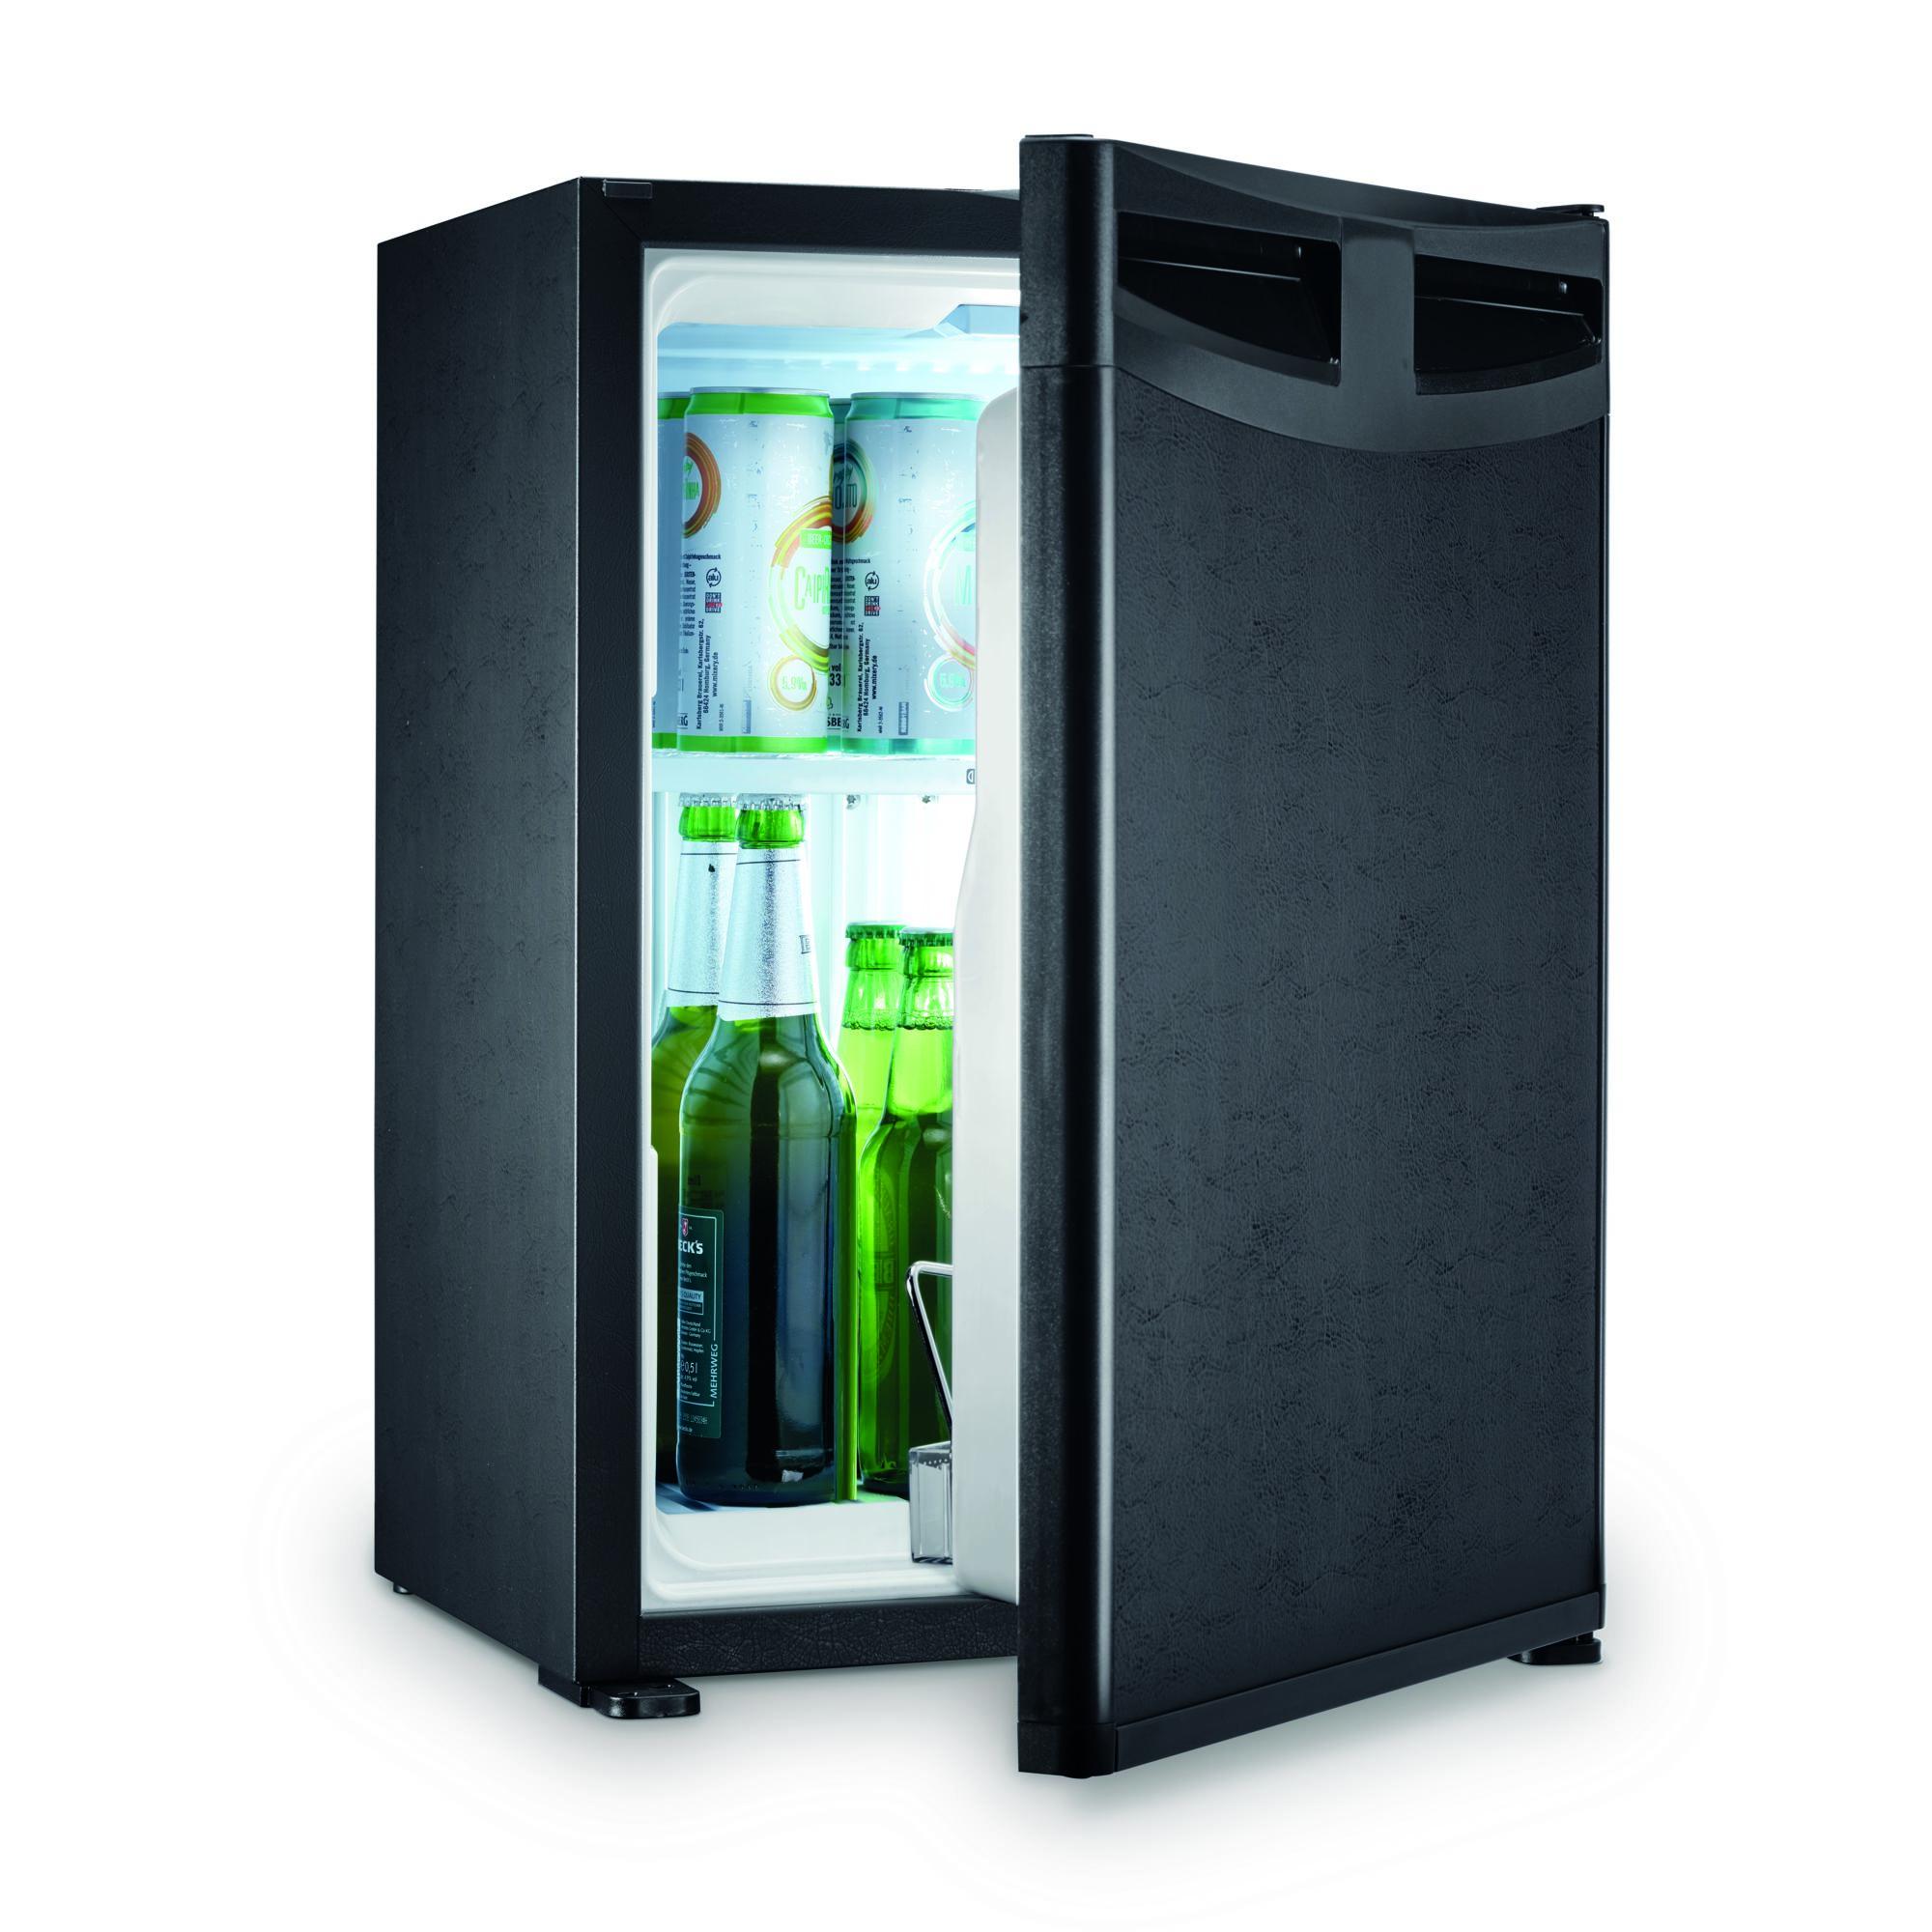 Minibar Dometic RH 440 NTE